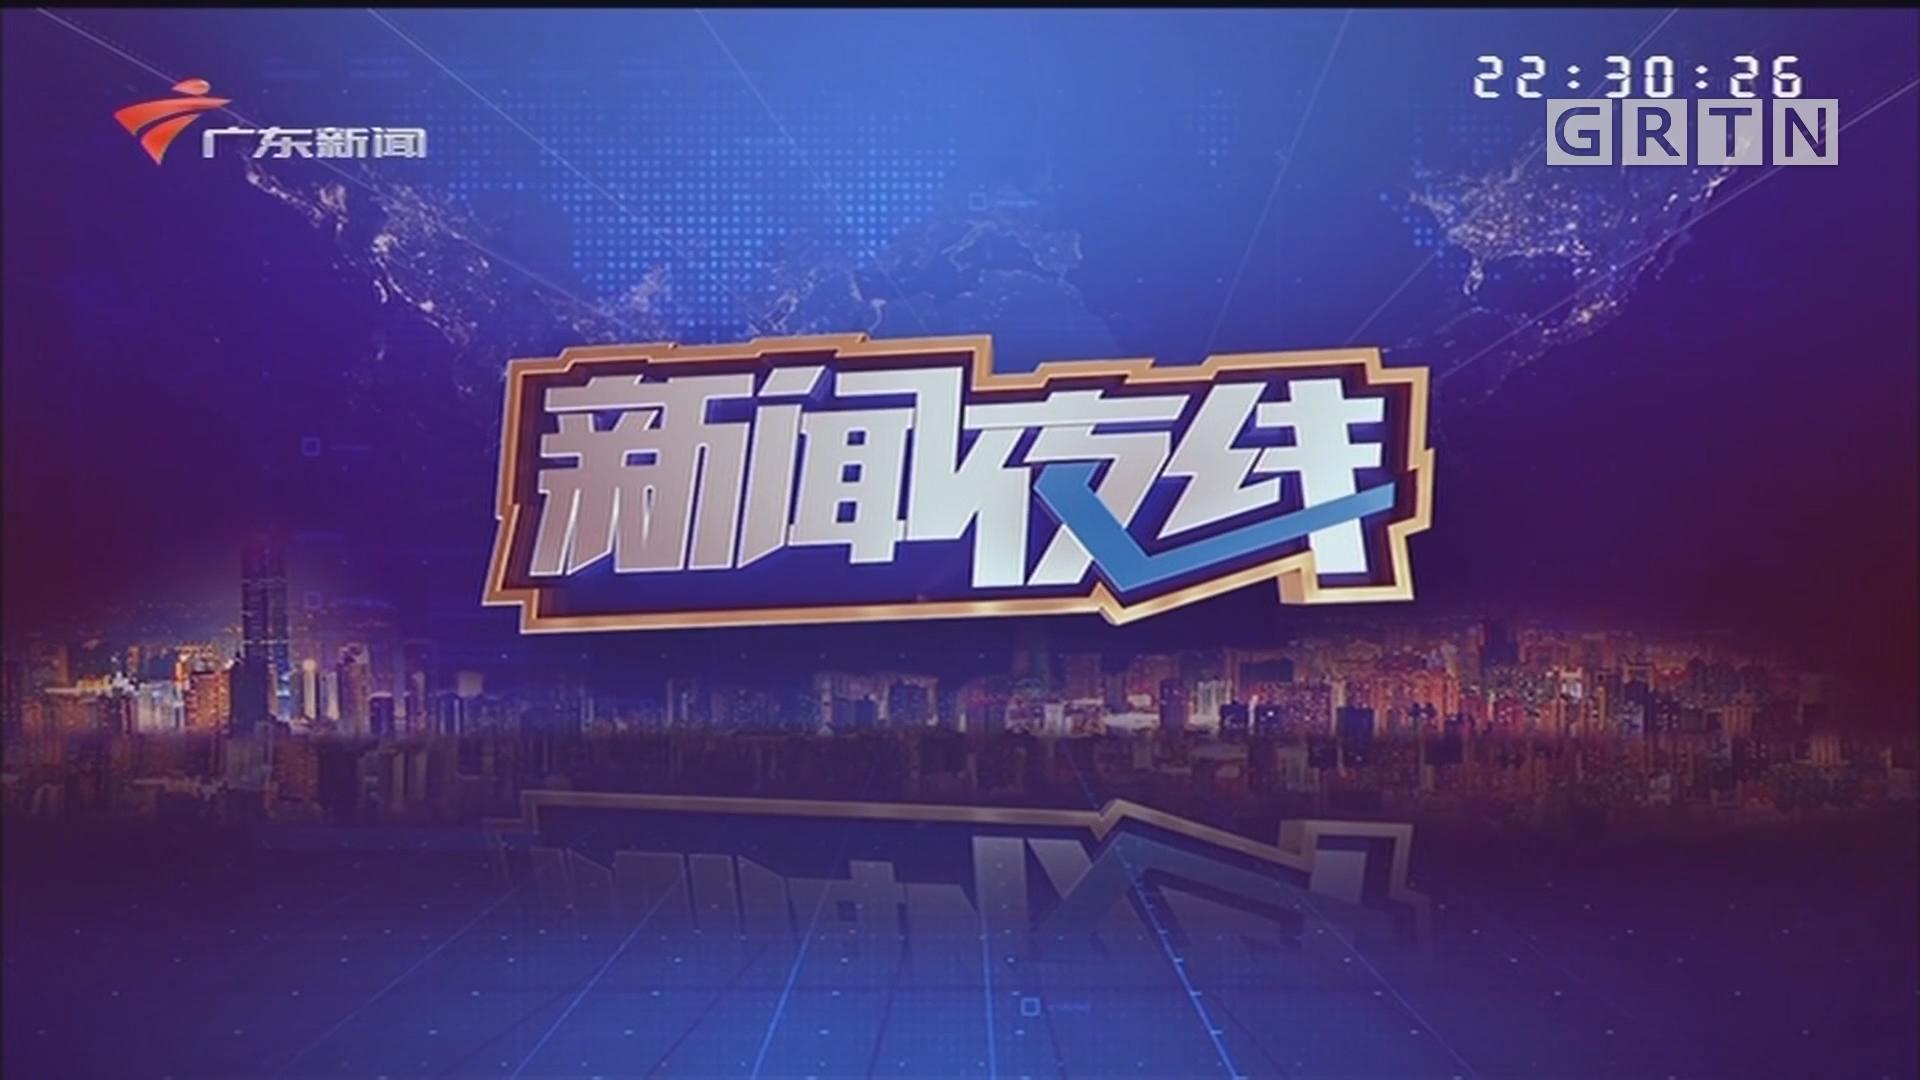 [HD][2020-05-16]新闻夜线:舒兰换帅 吉林省委发布关于舒兰市委书记职务任免的决定